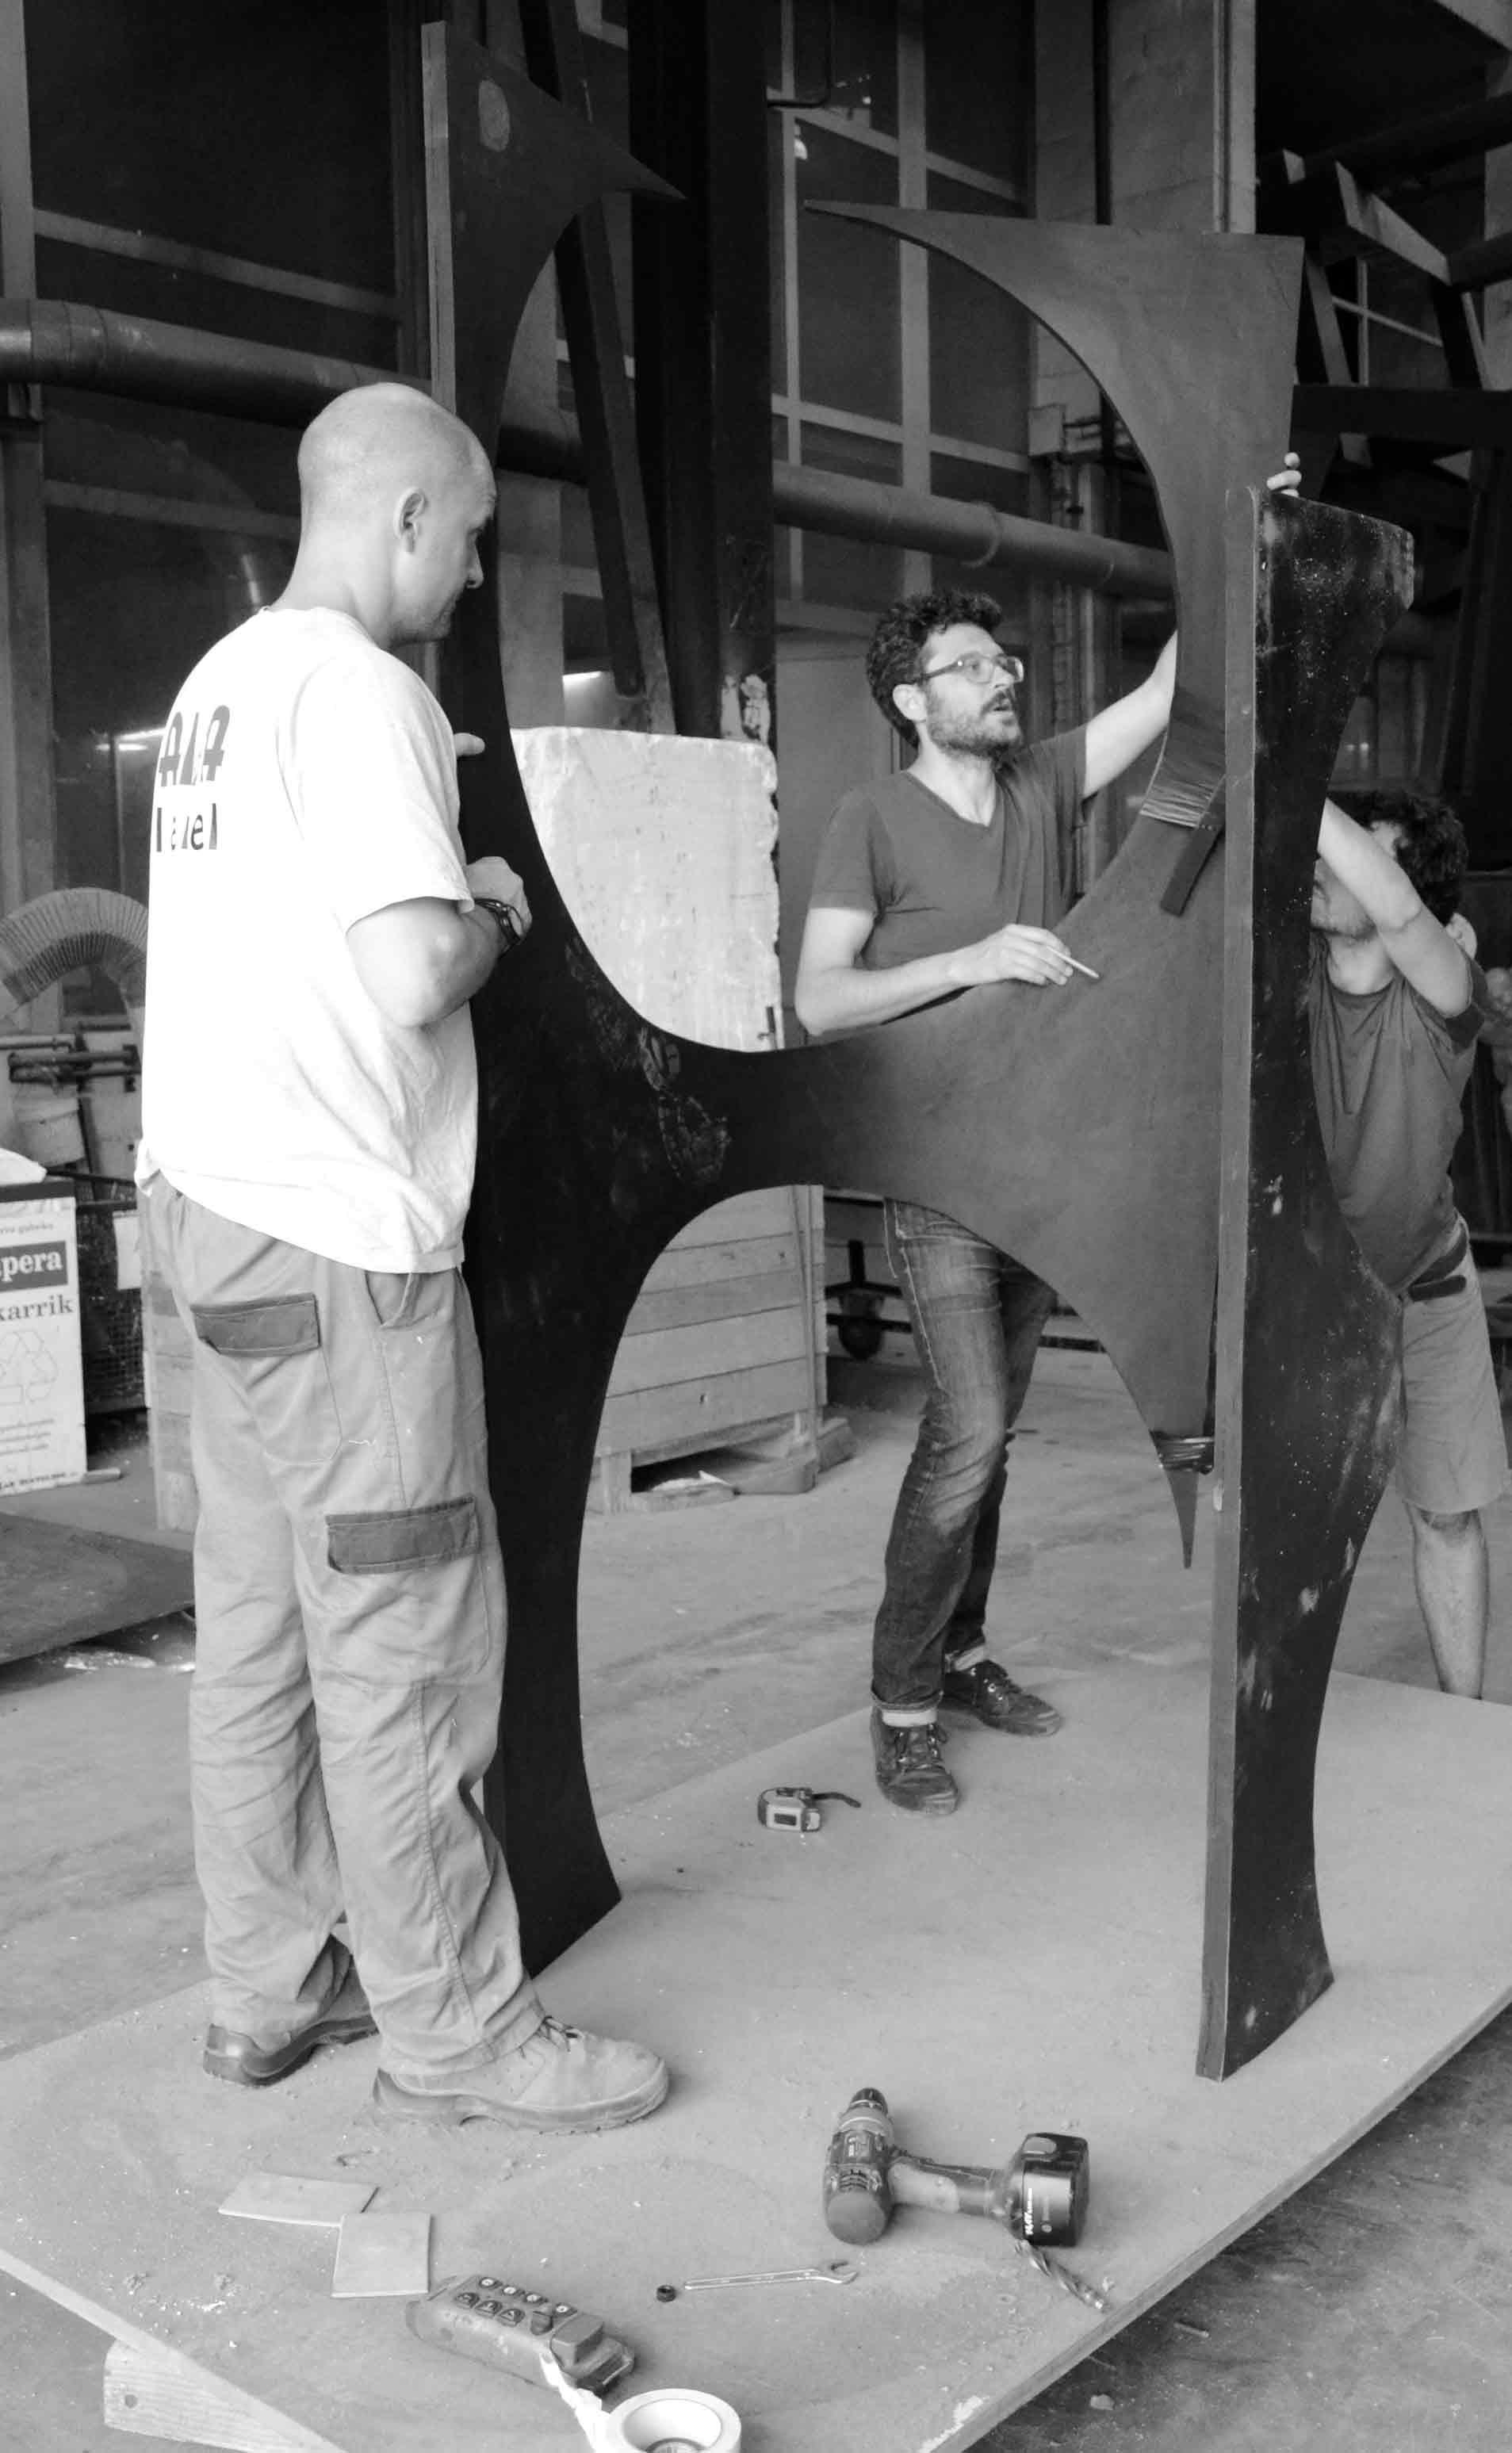 Asier Mendizabal in Alfa Arte. Project: AGORAMAQUIA (el caso exacto de la estatua)